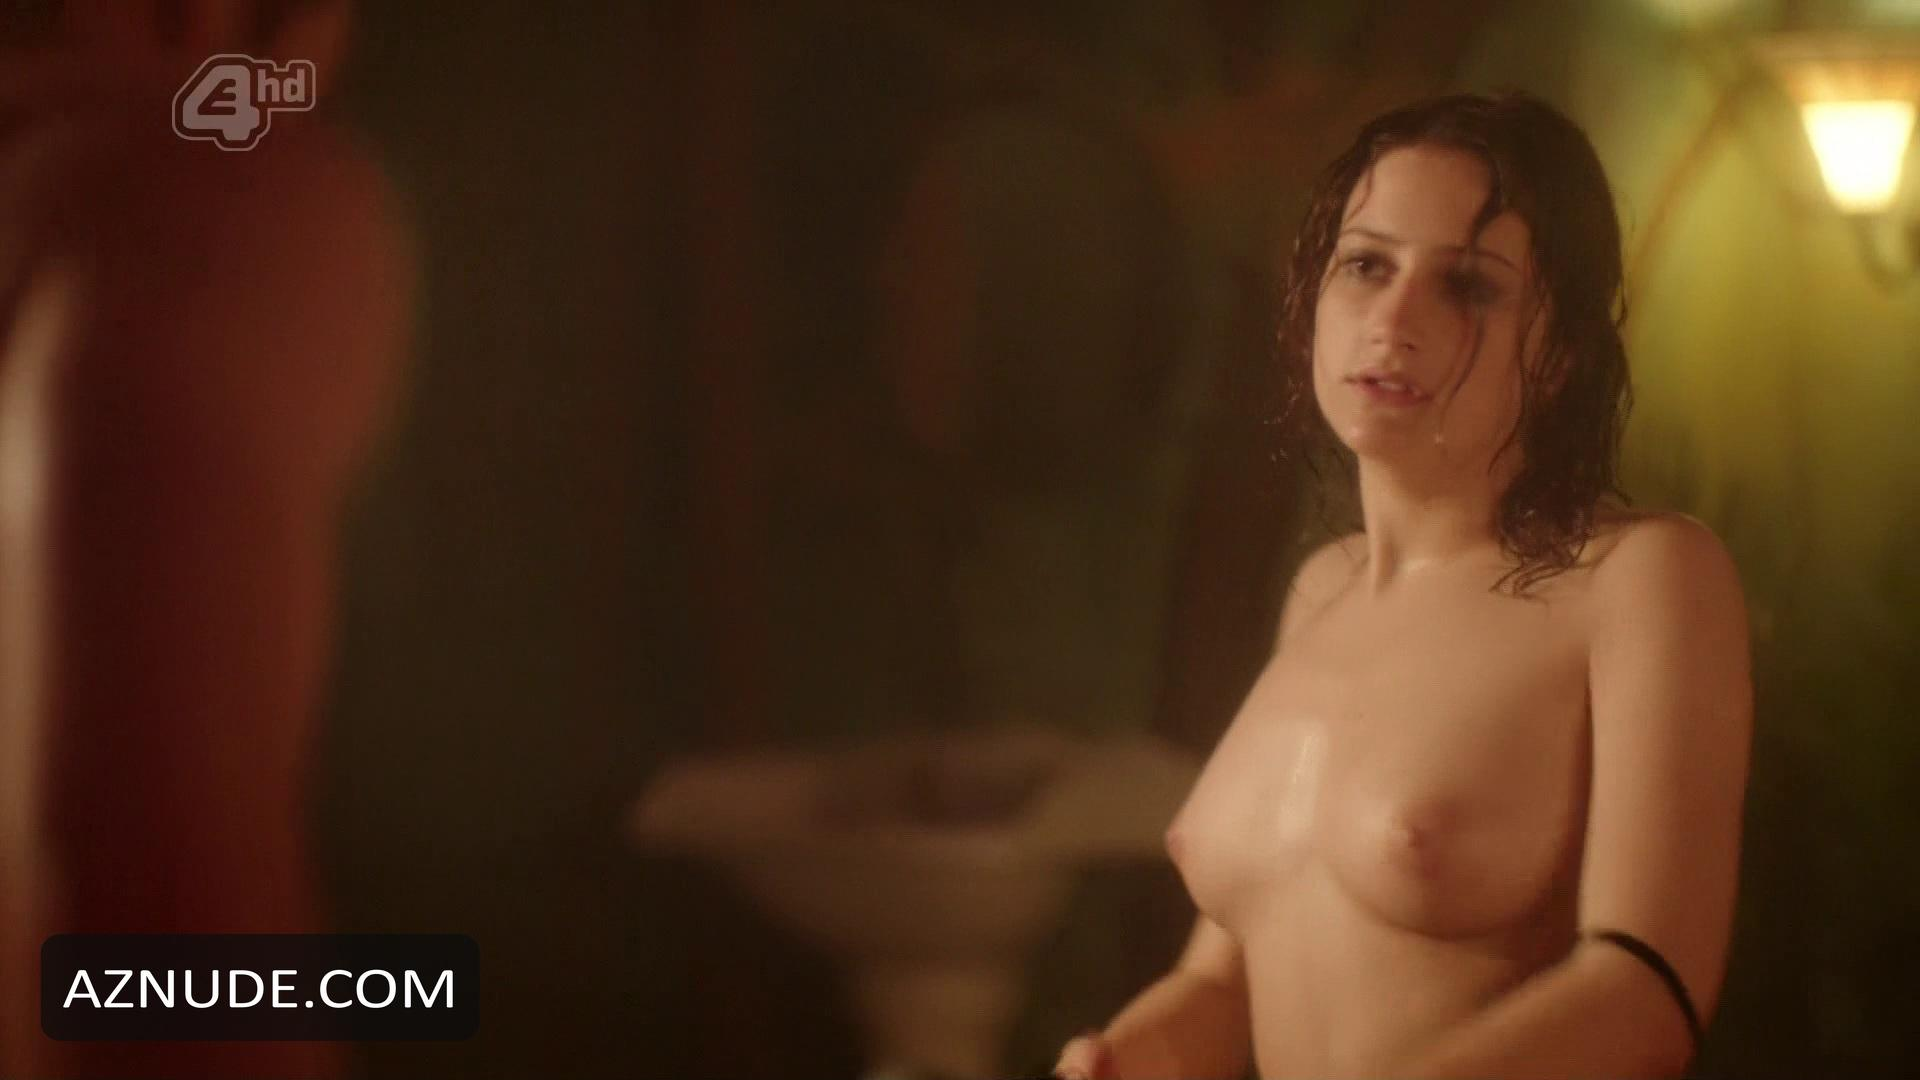 Lola Creton Nude - Aznude